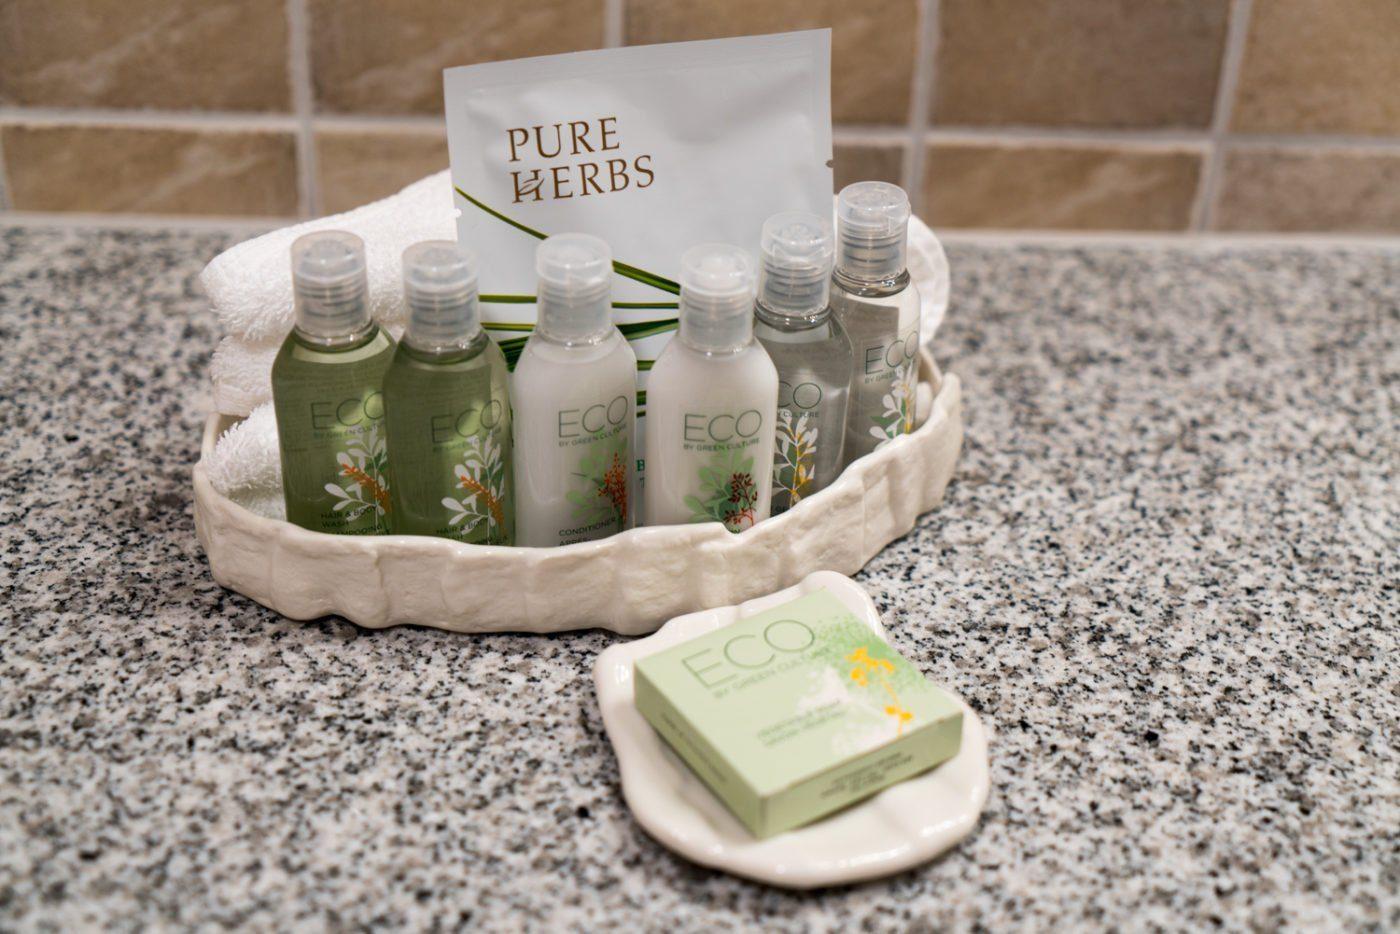 eco-friendly products at Hotel Ranga